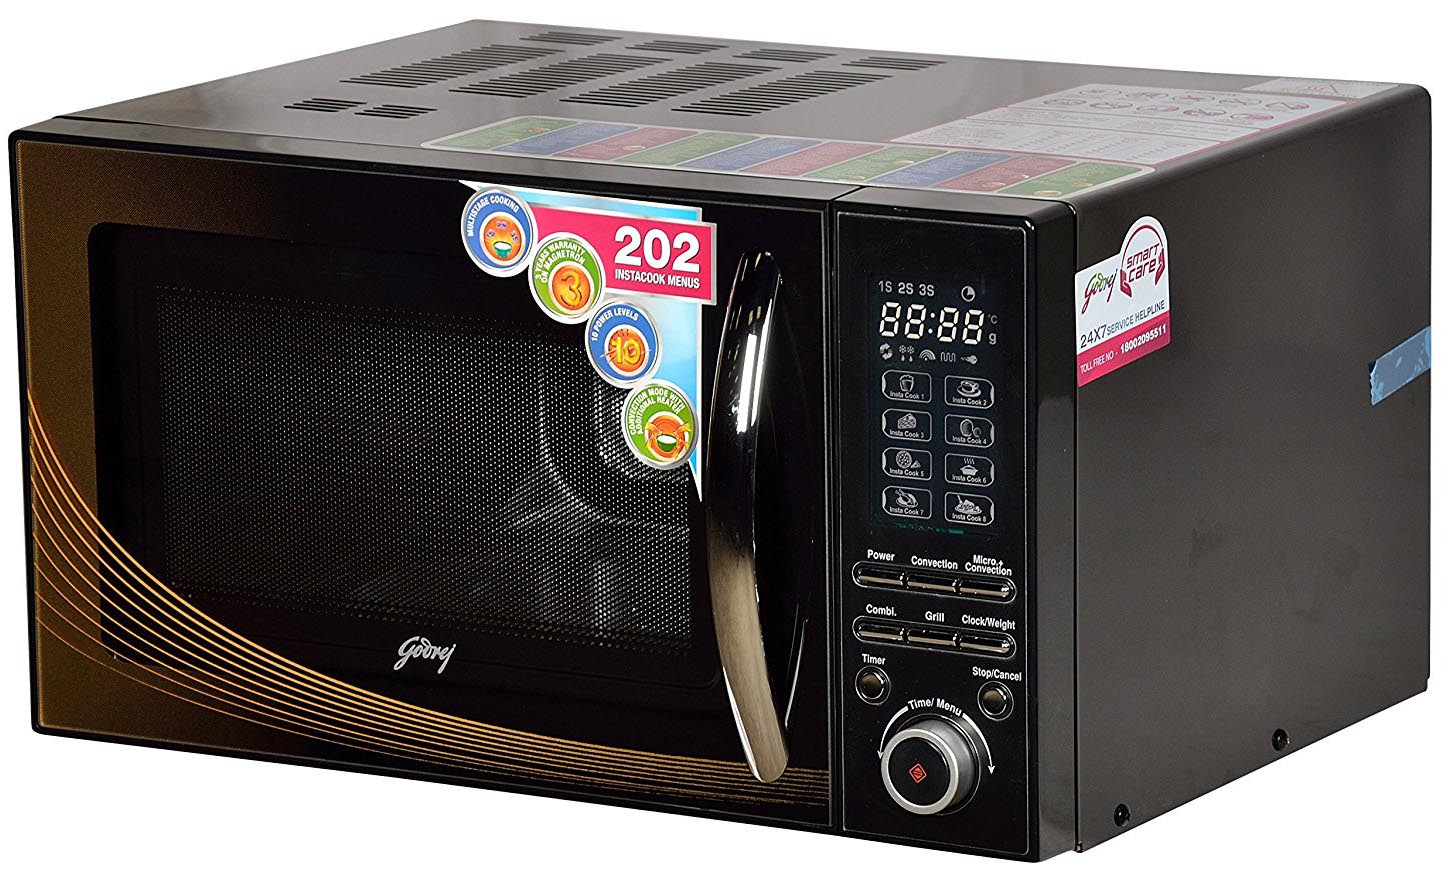 godrej 25 l convection microwave oven gmx25ca2fiz black floral